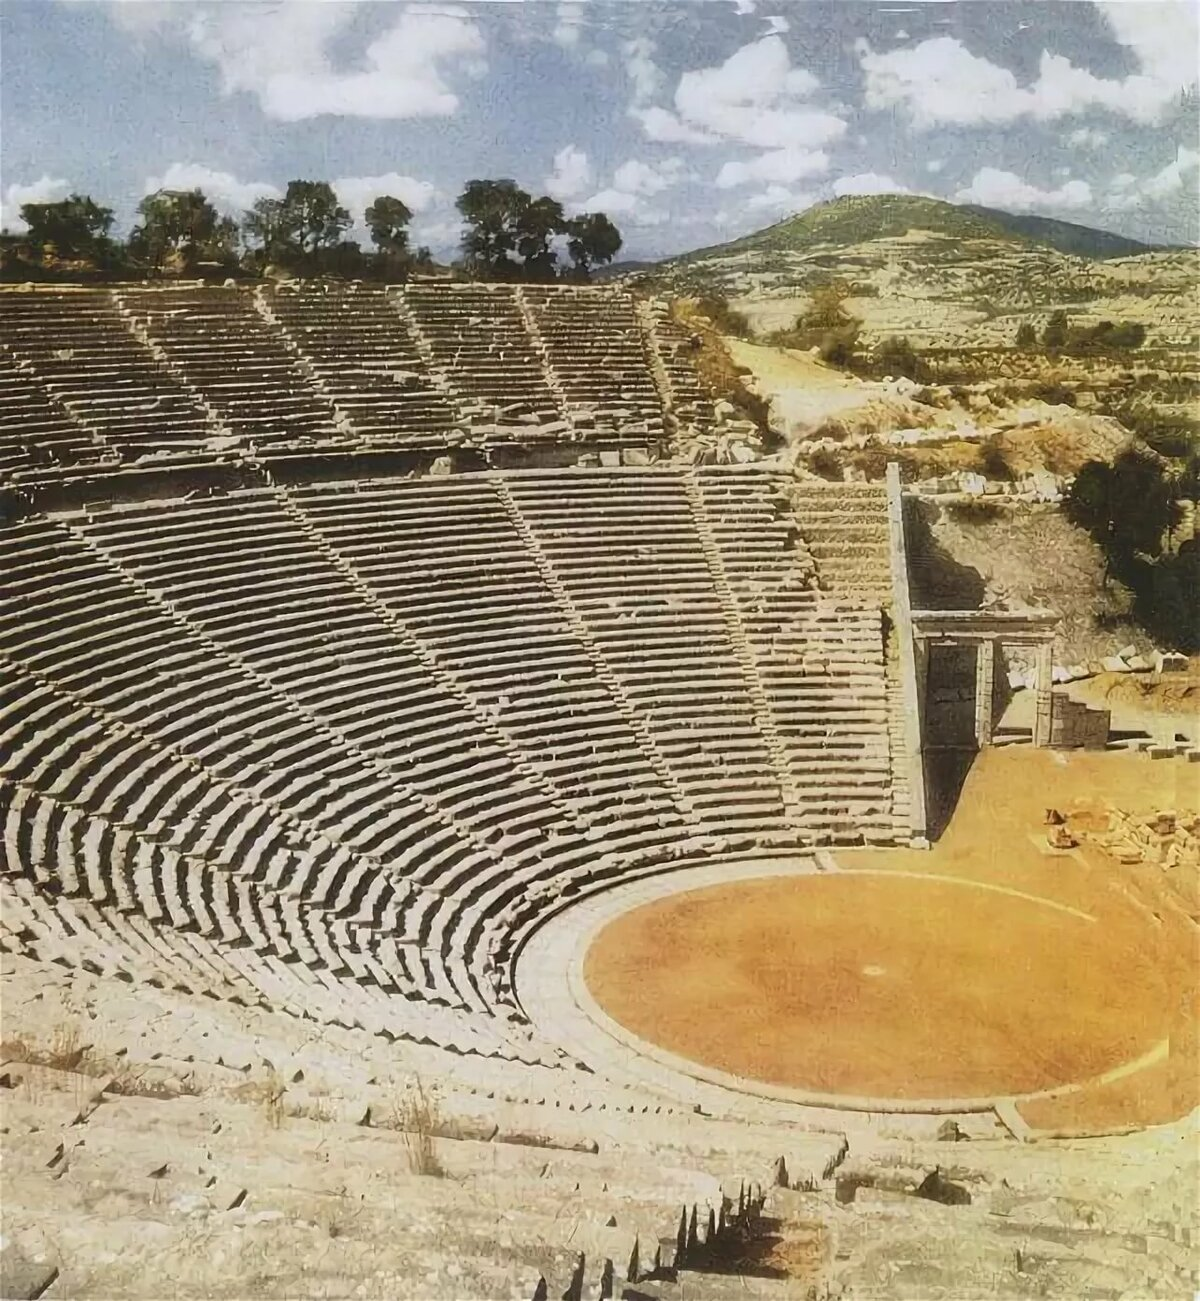 картинки по античному театру движущуюся